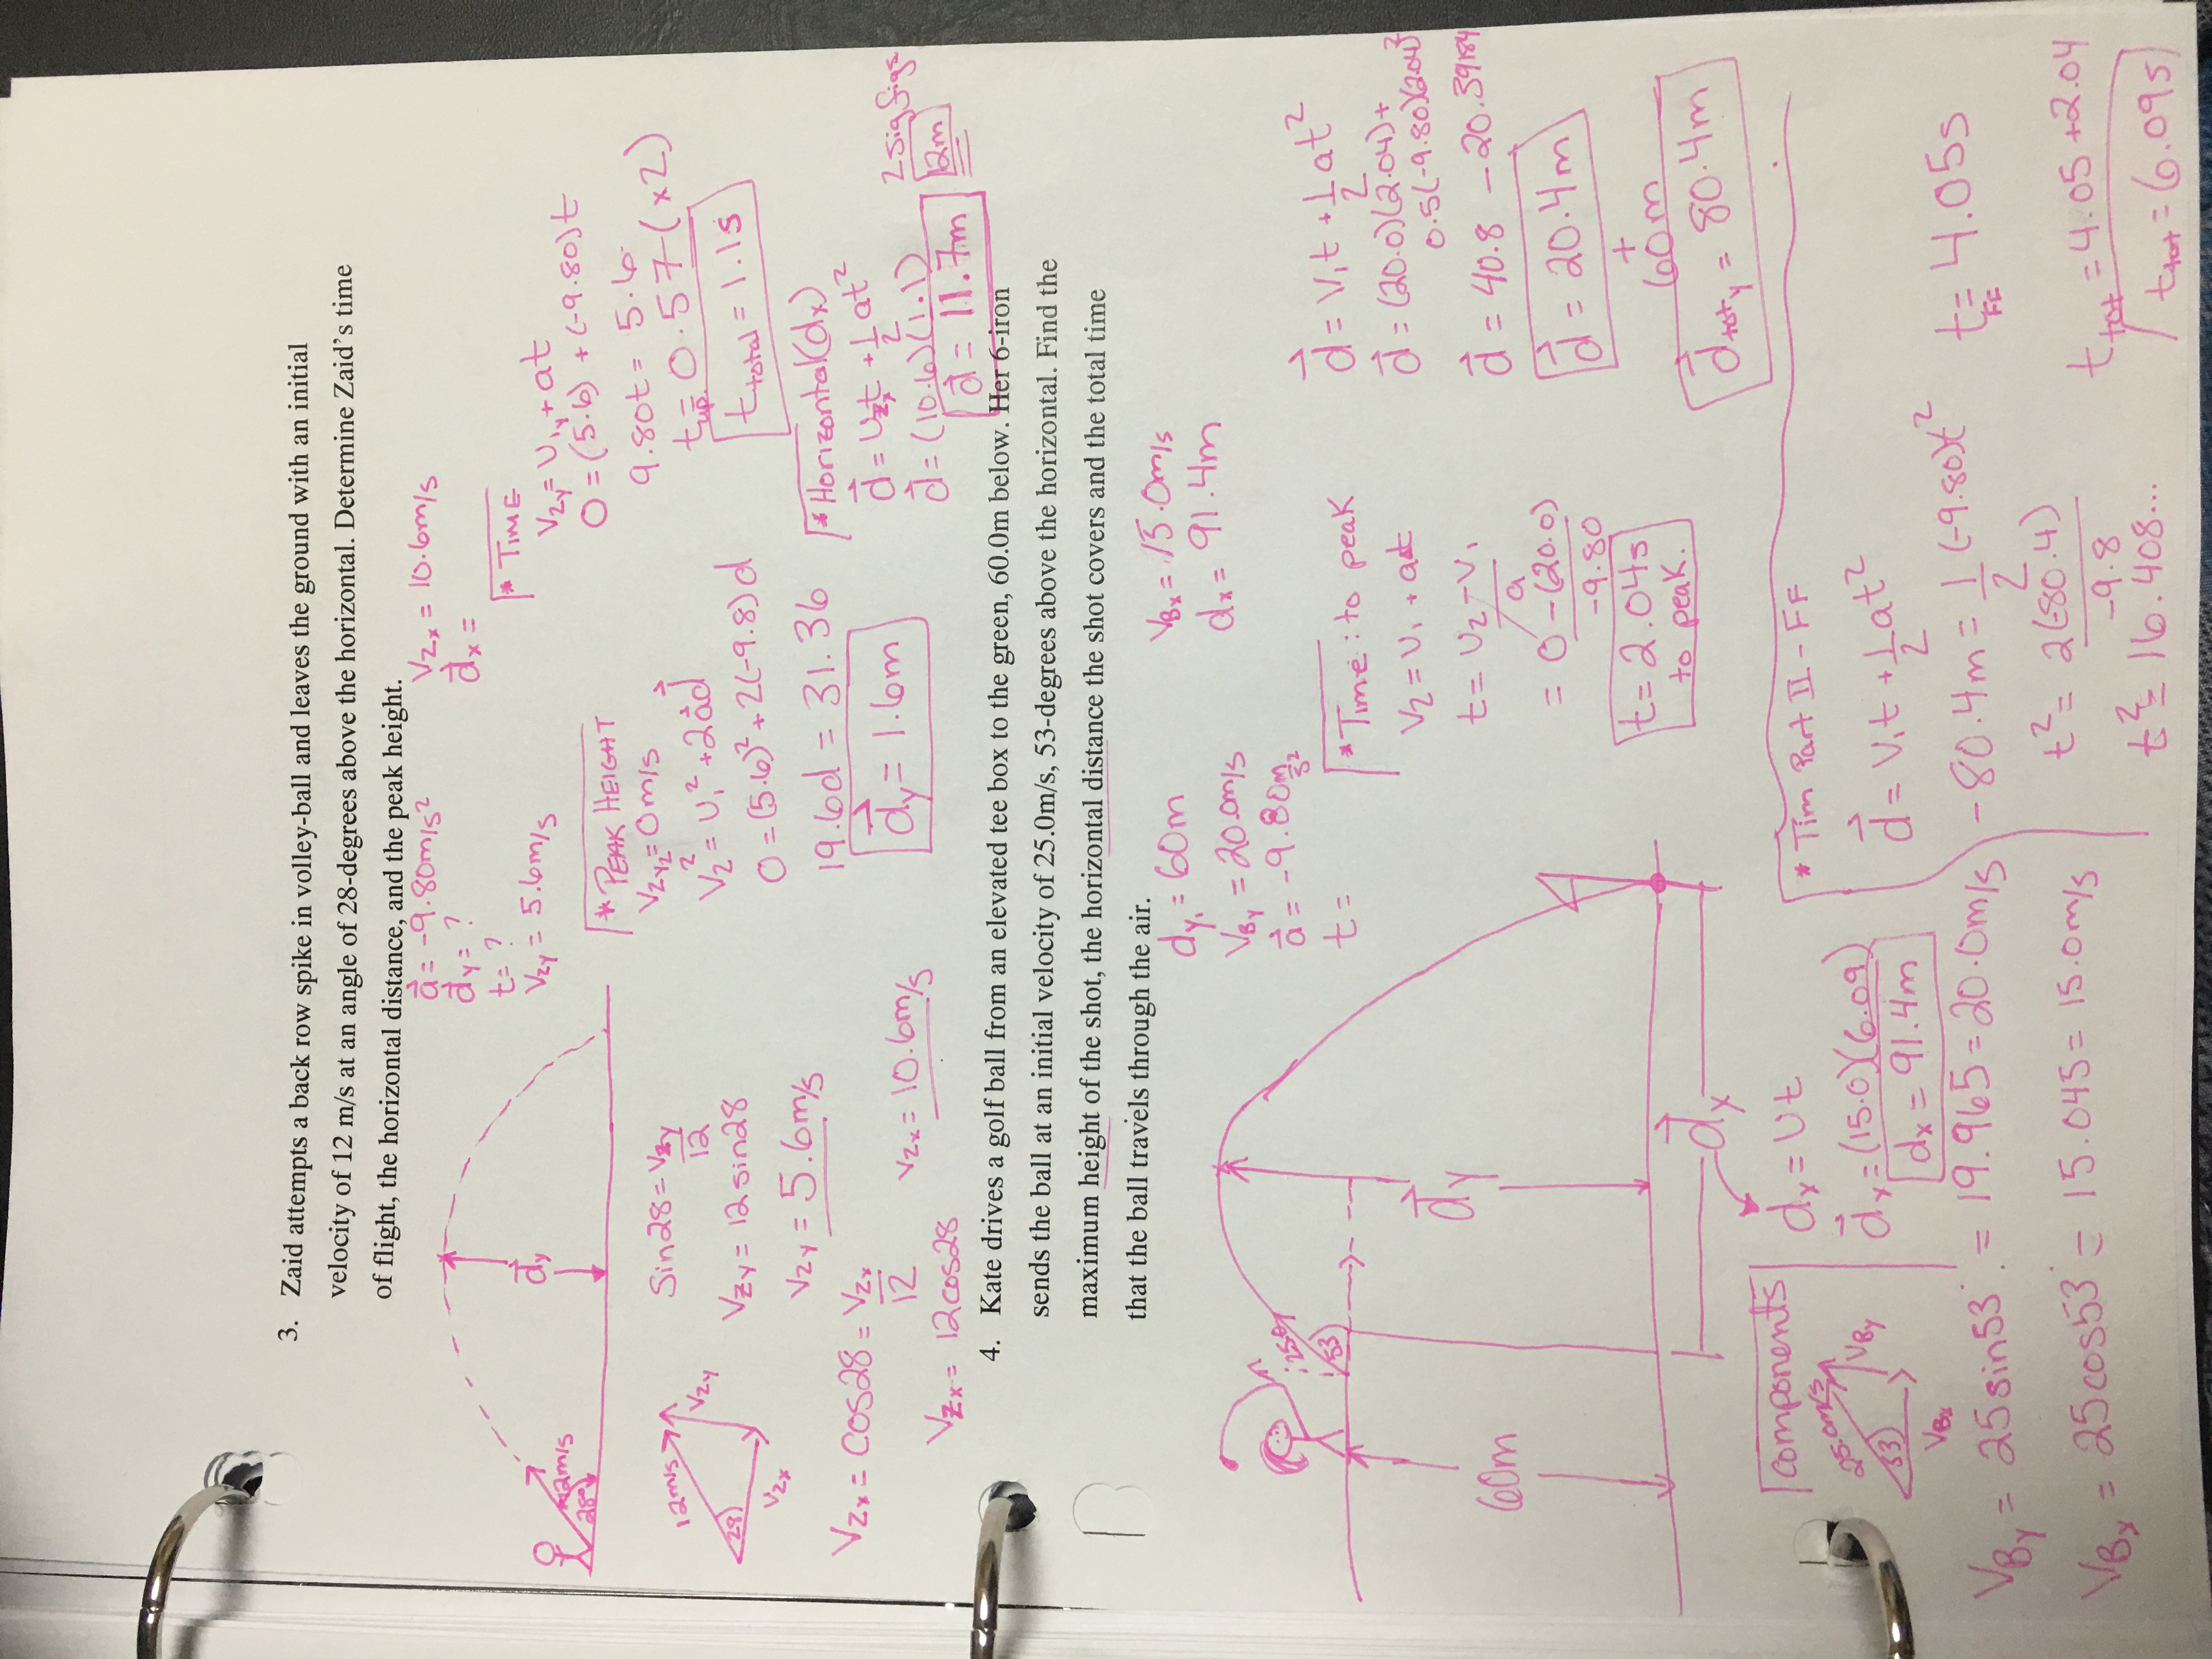 Physics 42s